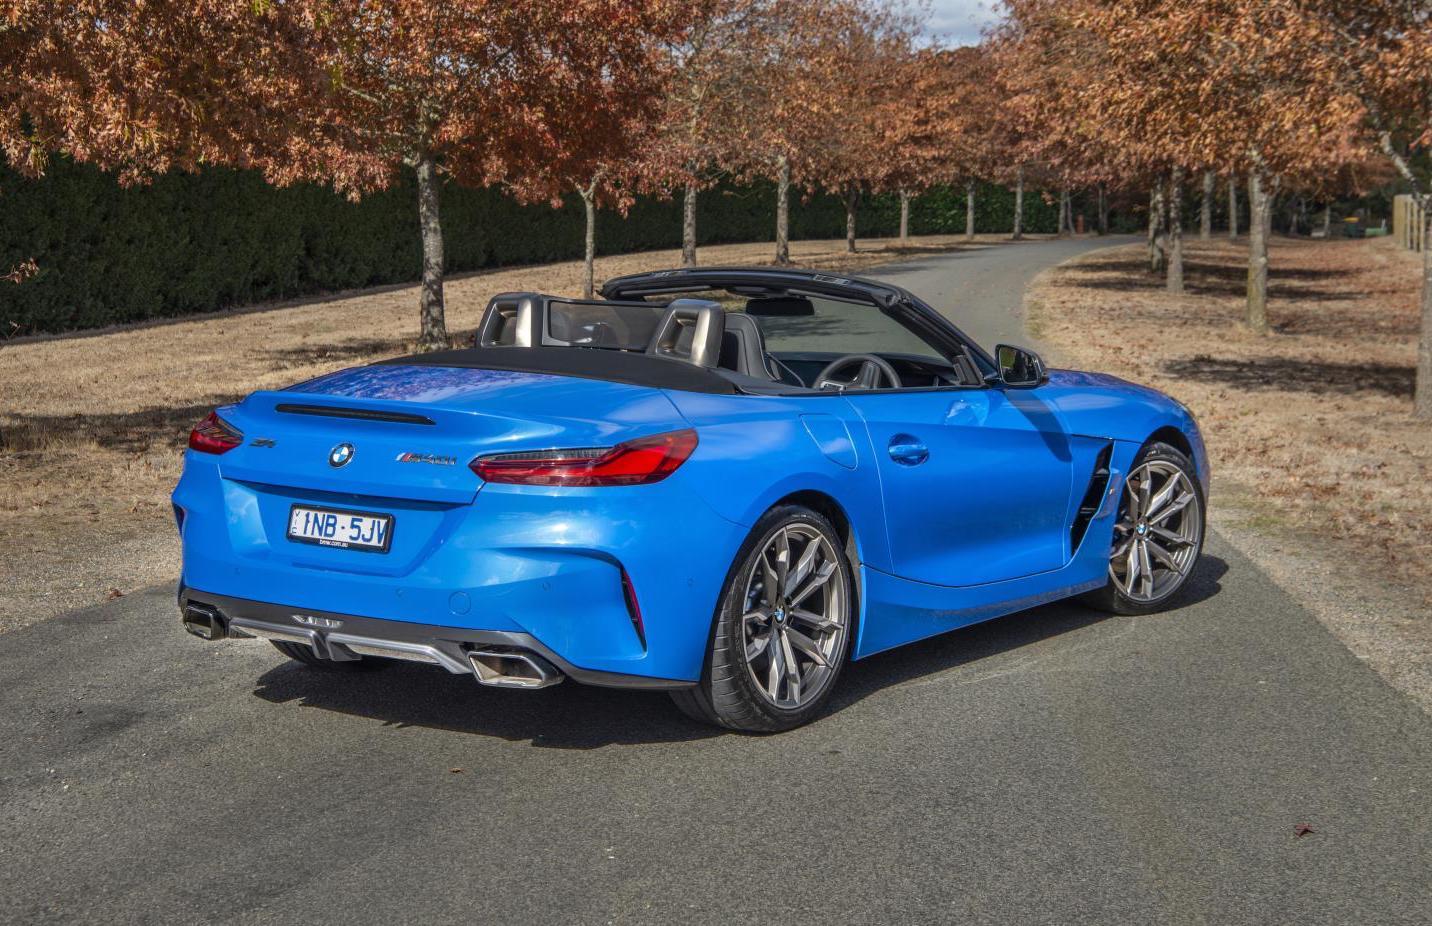 2019 Bmw Z4 Lands In Australia Topped By M40i Performancedrive